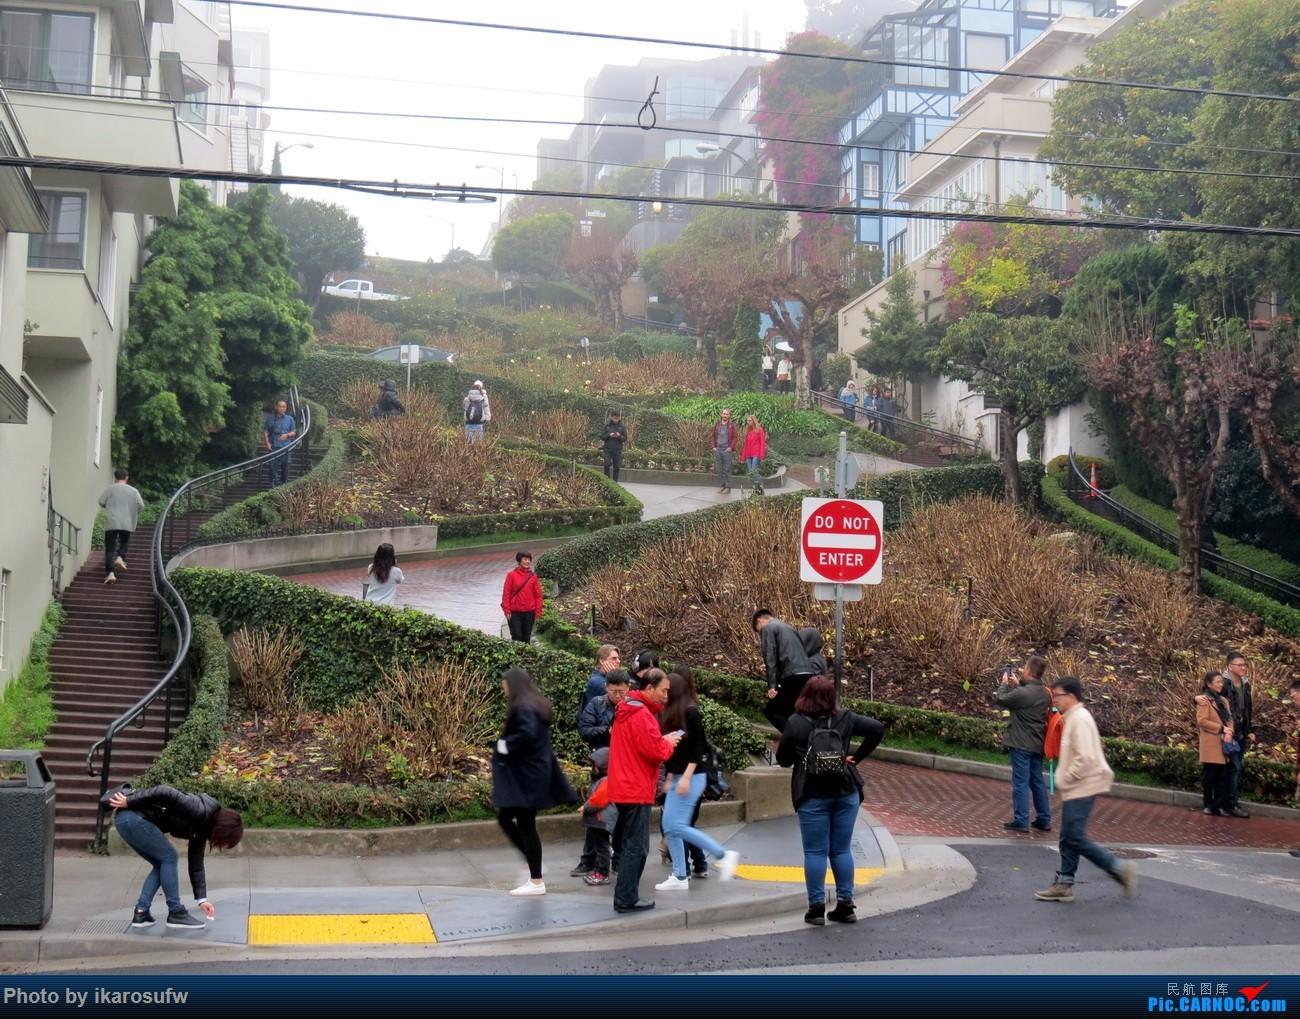 Re:[原创]圣诞节新年 新加坡北京旧金山/洛杉矶北京新加坡往返全记录及美西20日之旅 中国国际航空 CA970/985/988/975(一)